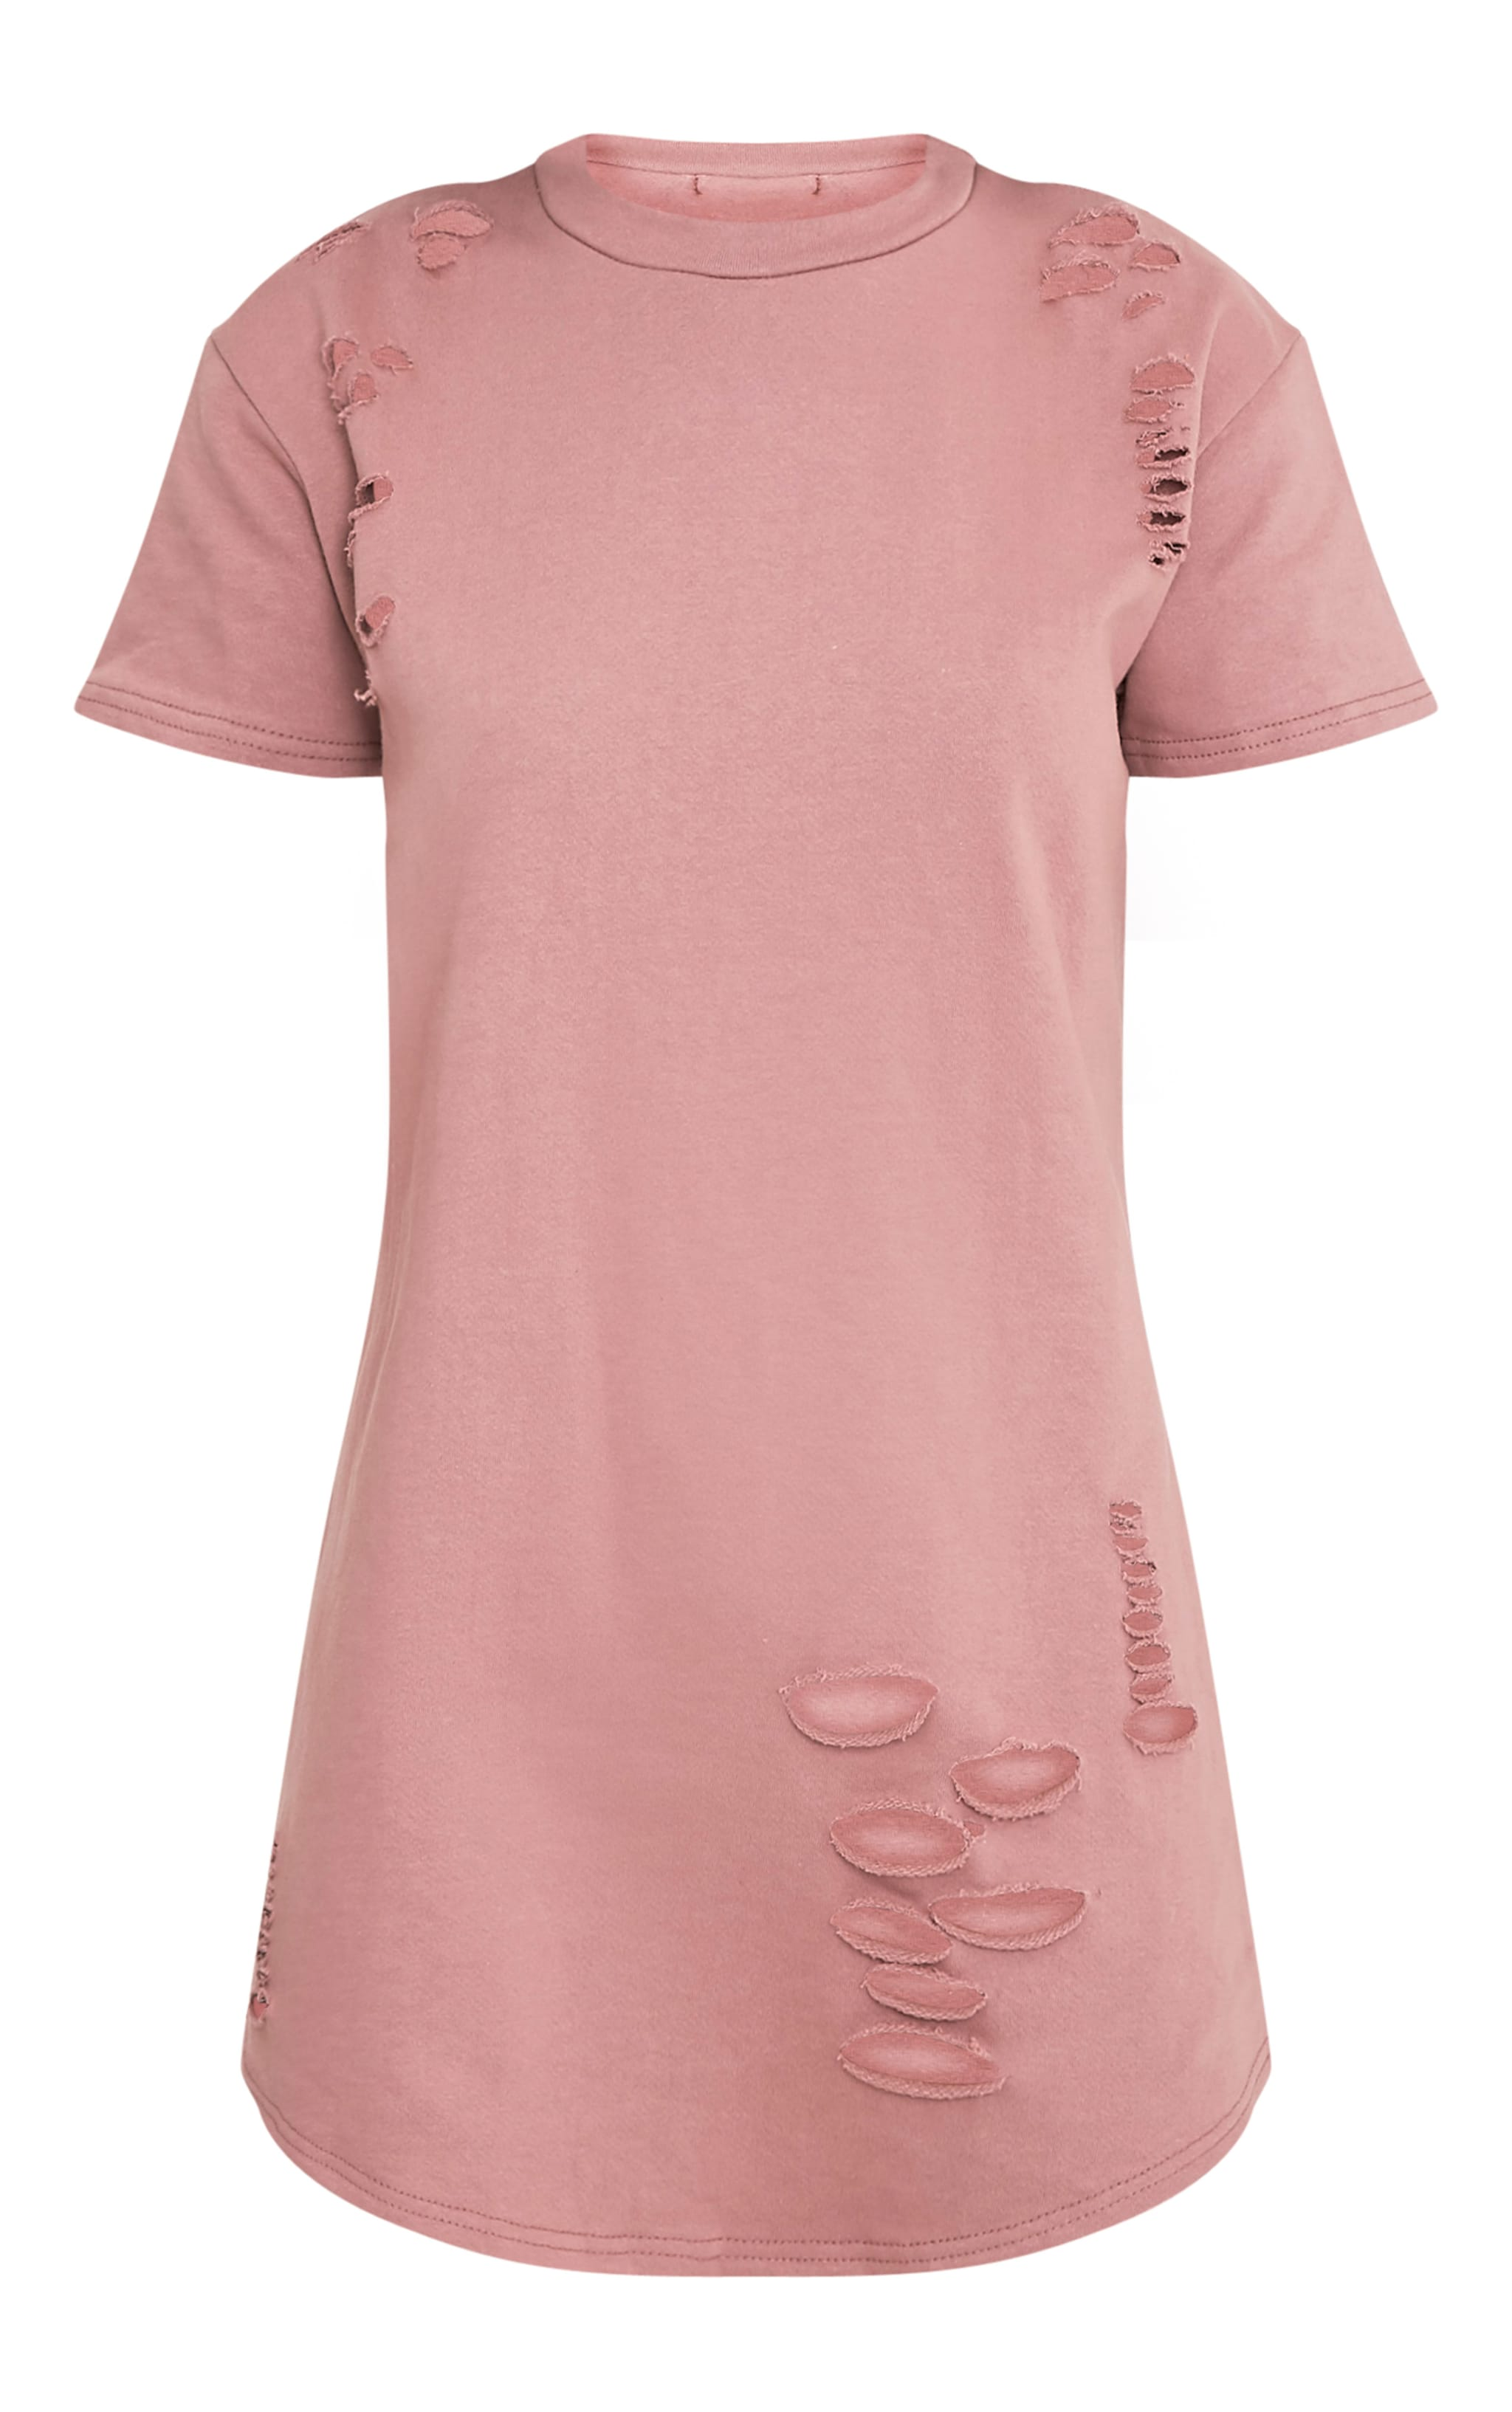 Kelisa Dark Mauve Distressed Short Sleeve T-Shirt Dress 3